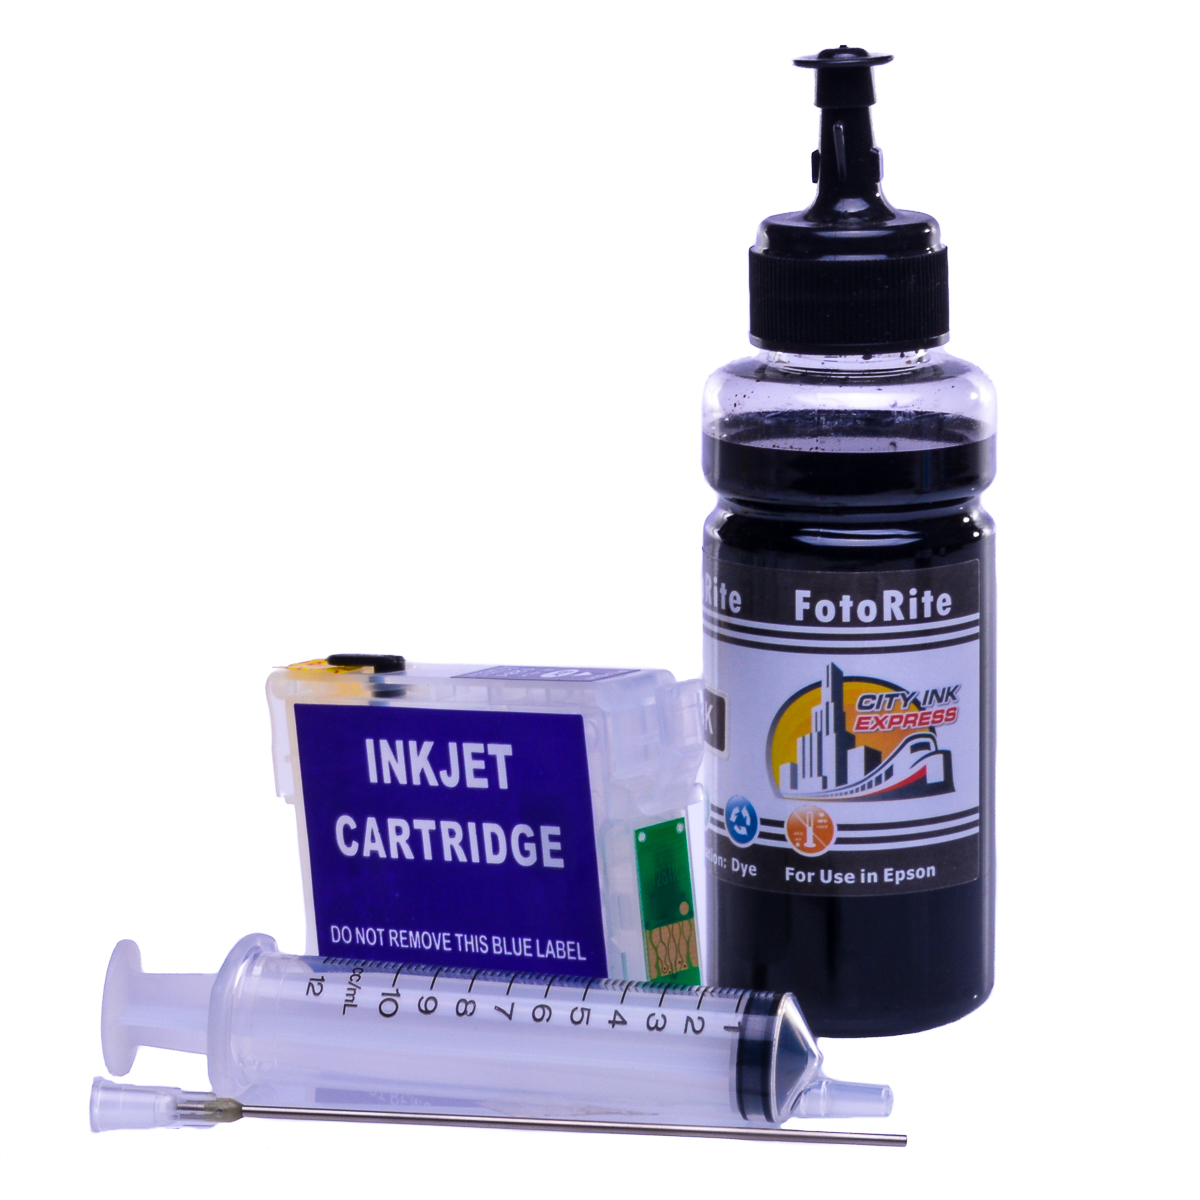 Refillable T0801 Black Cheap printer cartridges for Epson Stylus PX800FW C13T08014010 dye ink